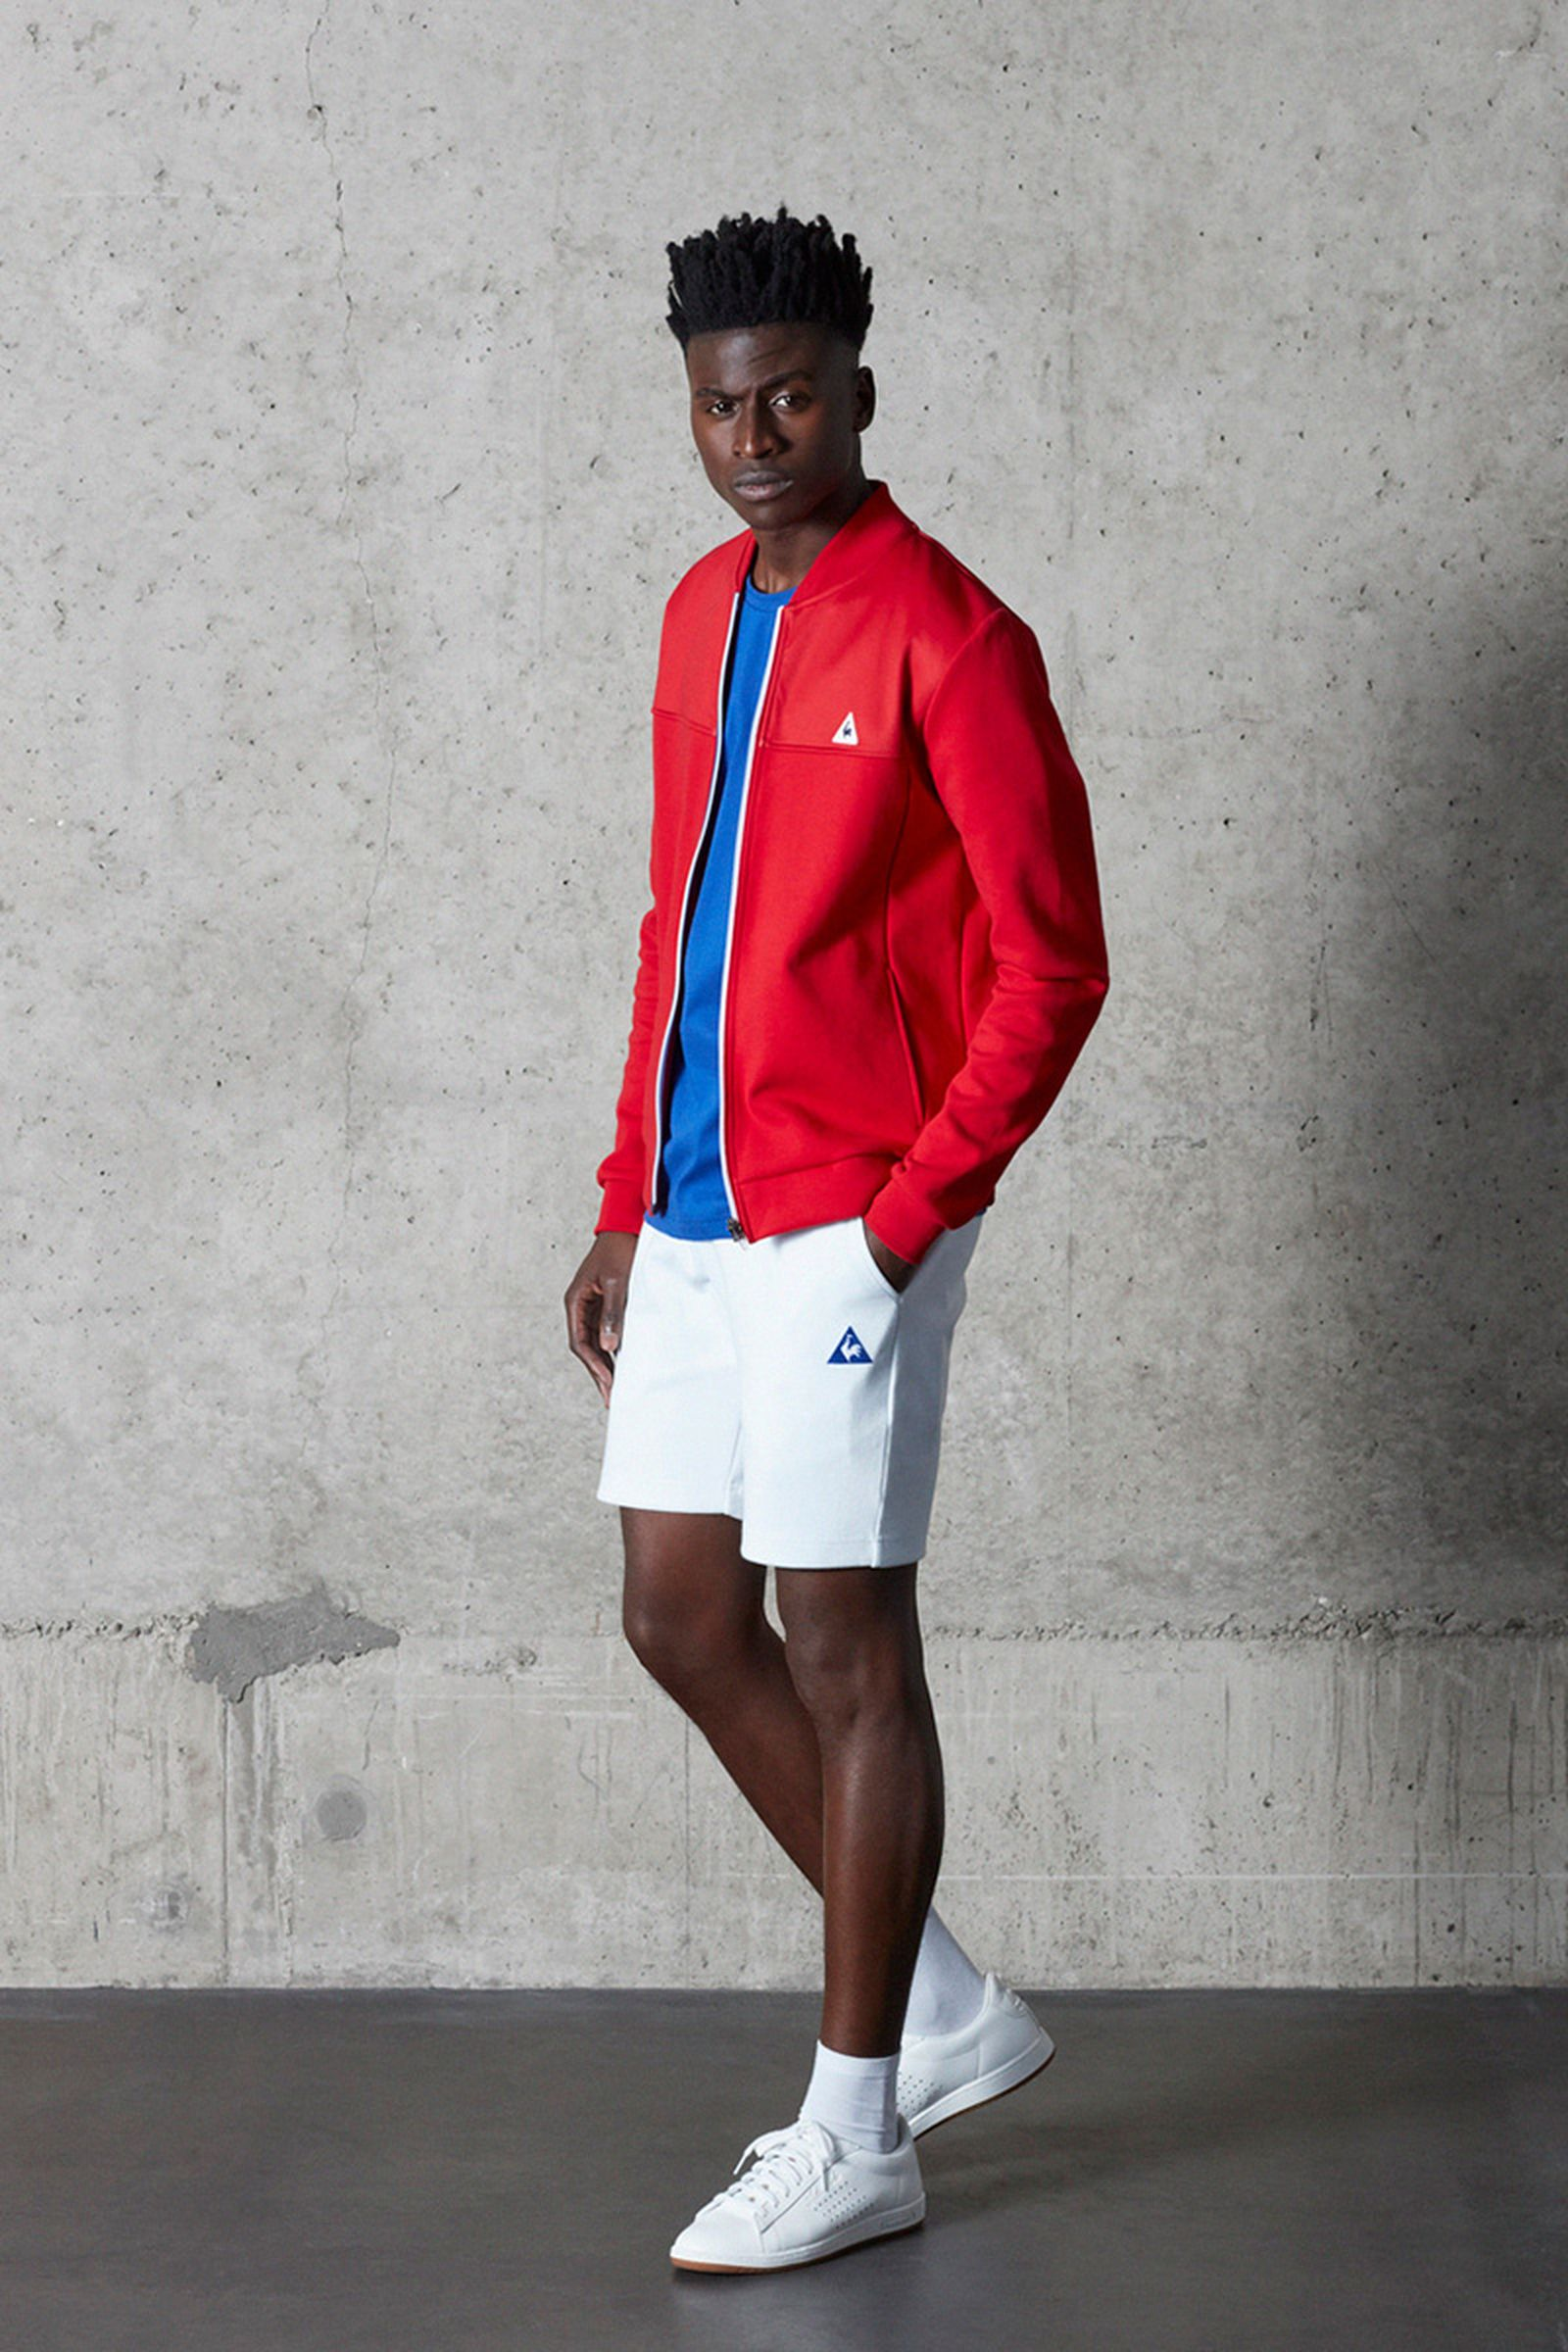 best sports brands Adidas HOKA Nike